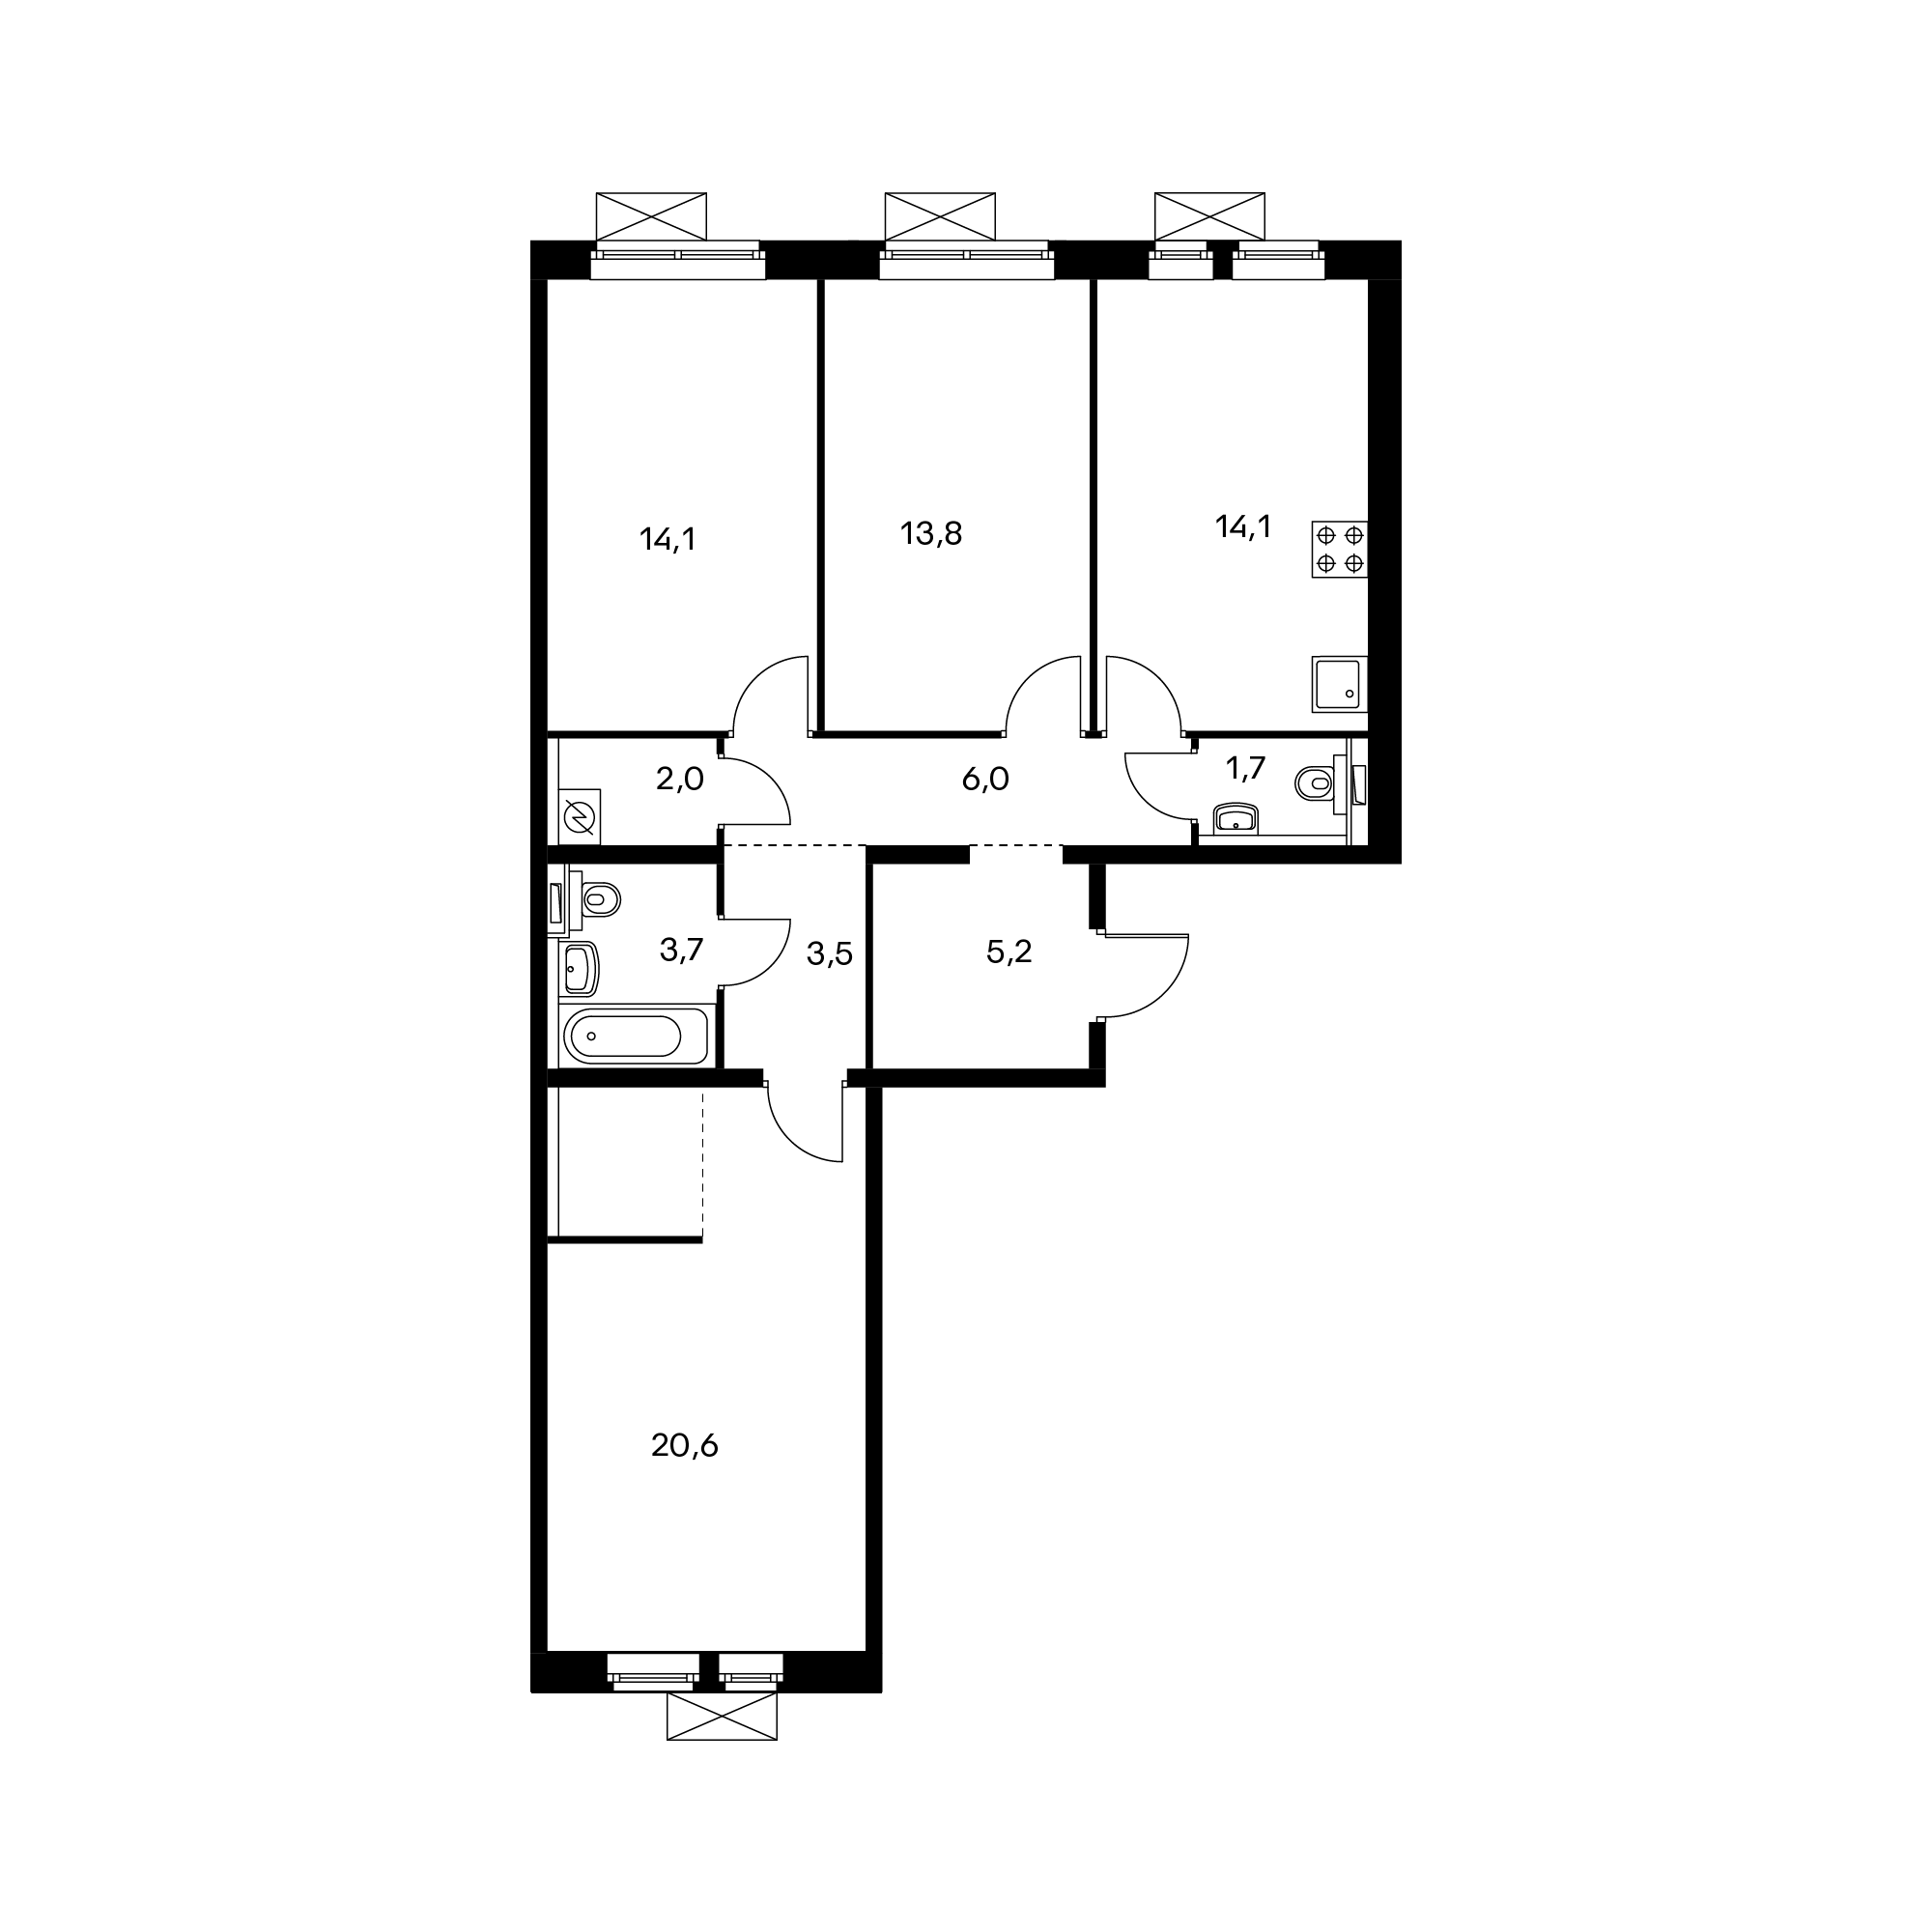 3KL13_9.0-1_S_Z2*